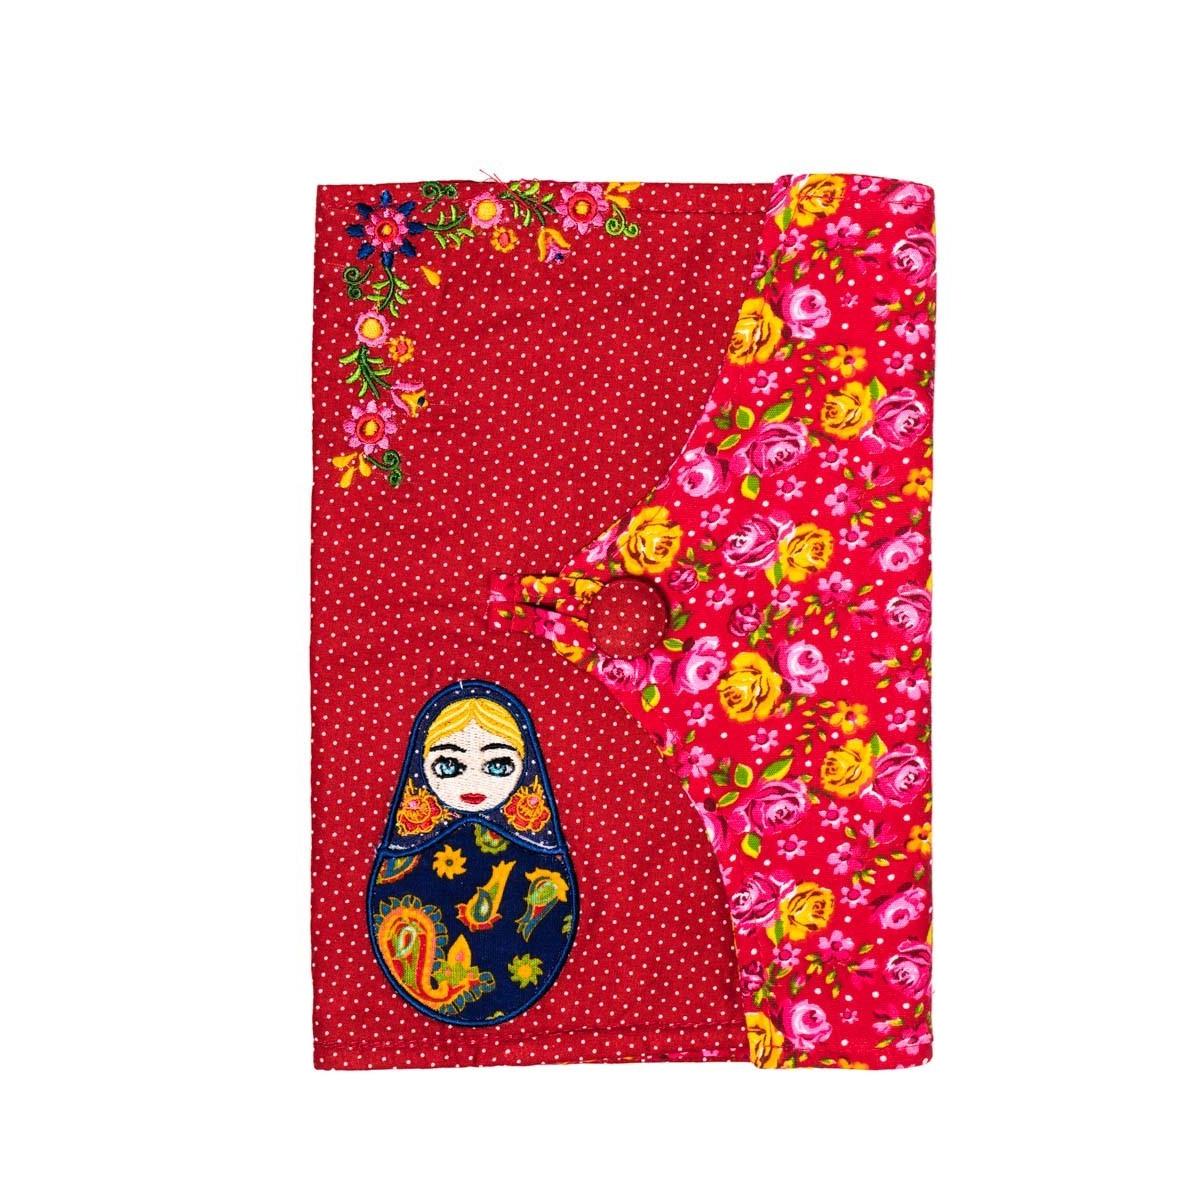 Protège carnet de santé fille tissu original Matriochka